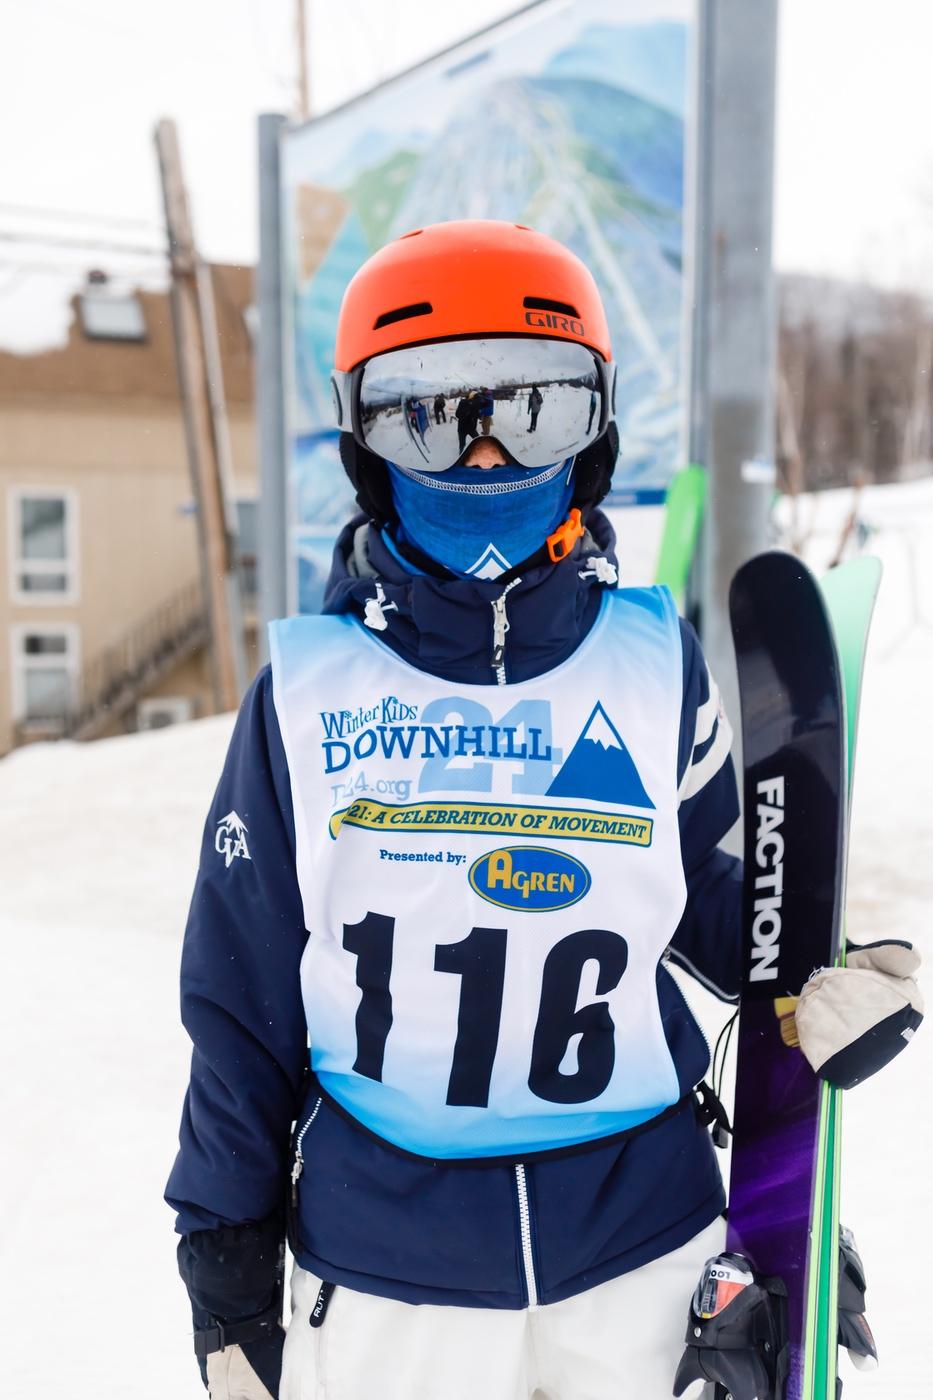 WinterKids Downhill 24 2021 SDP 2612